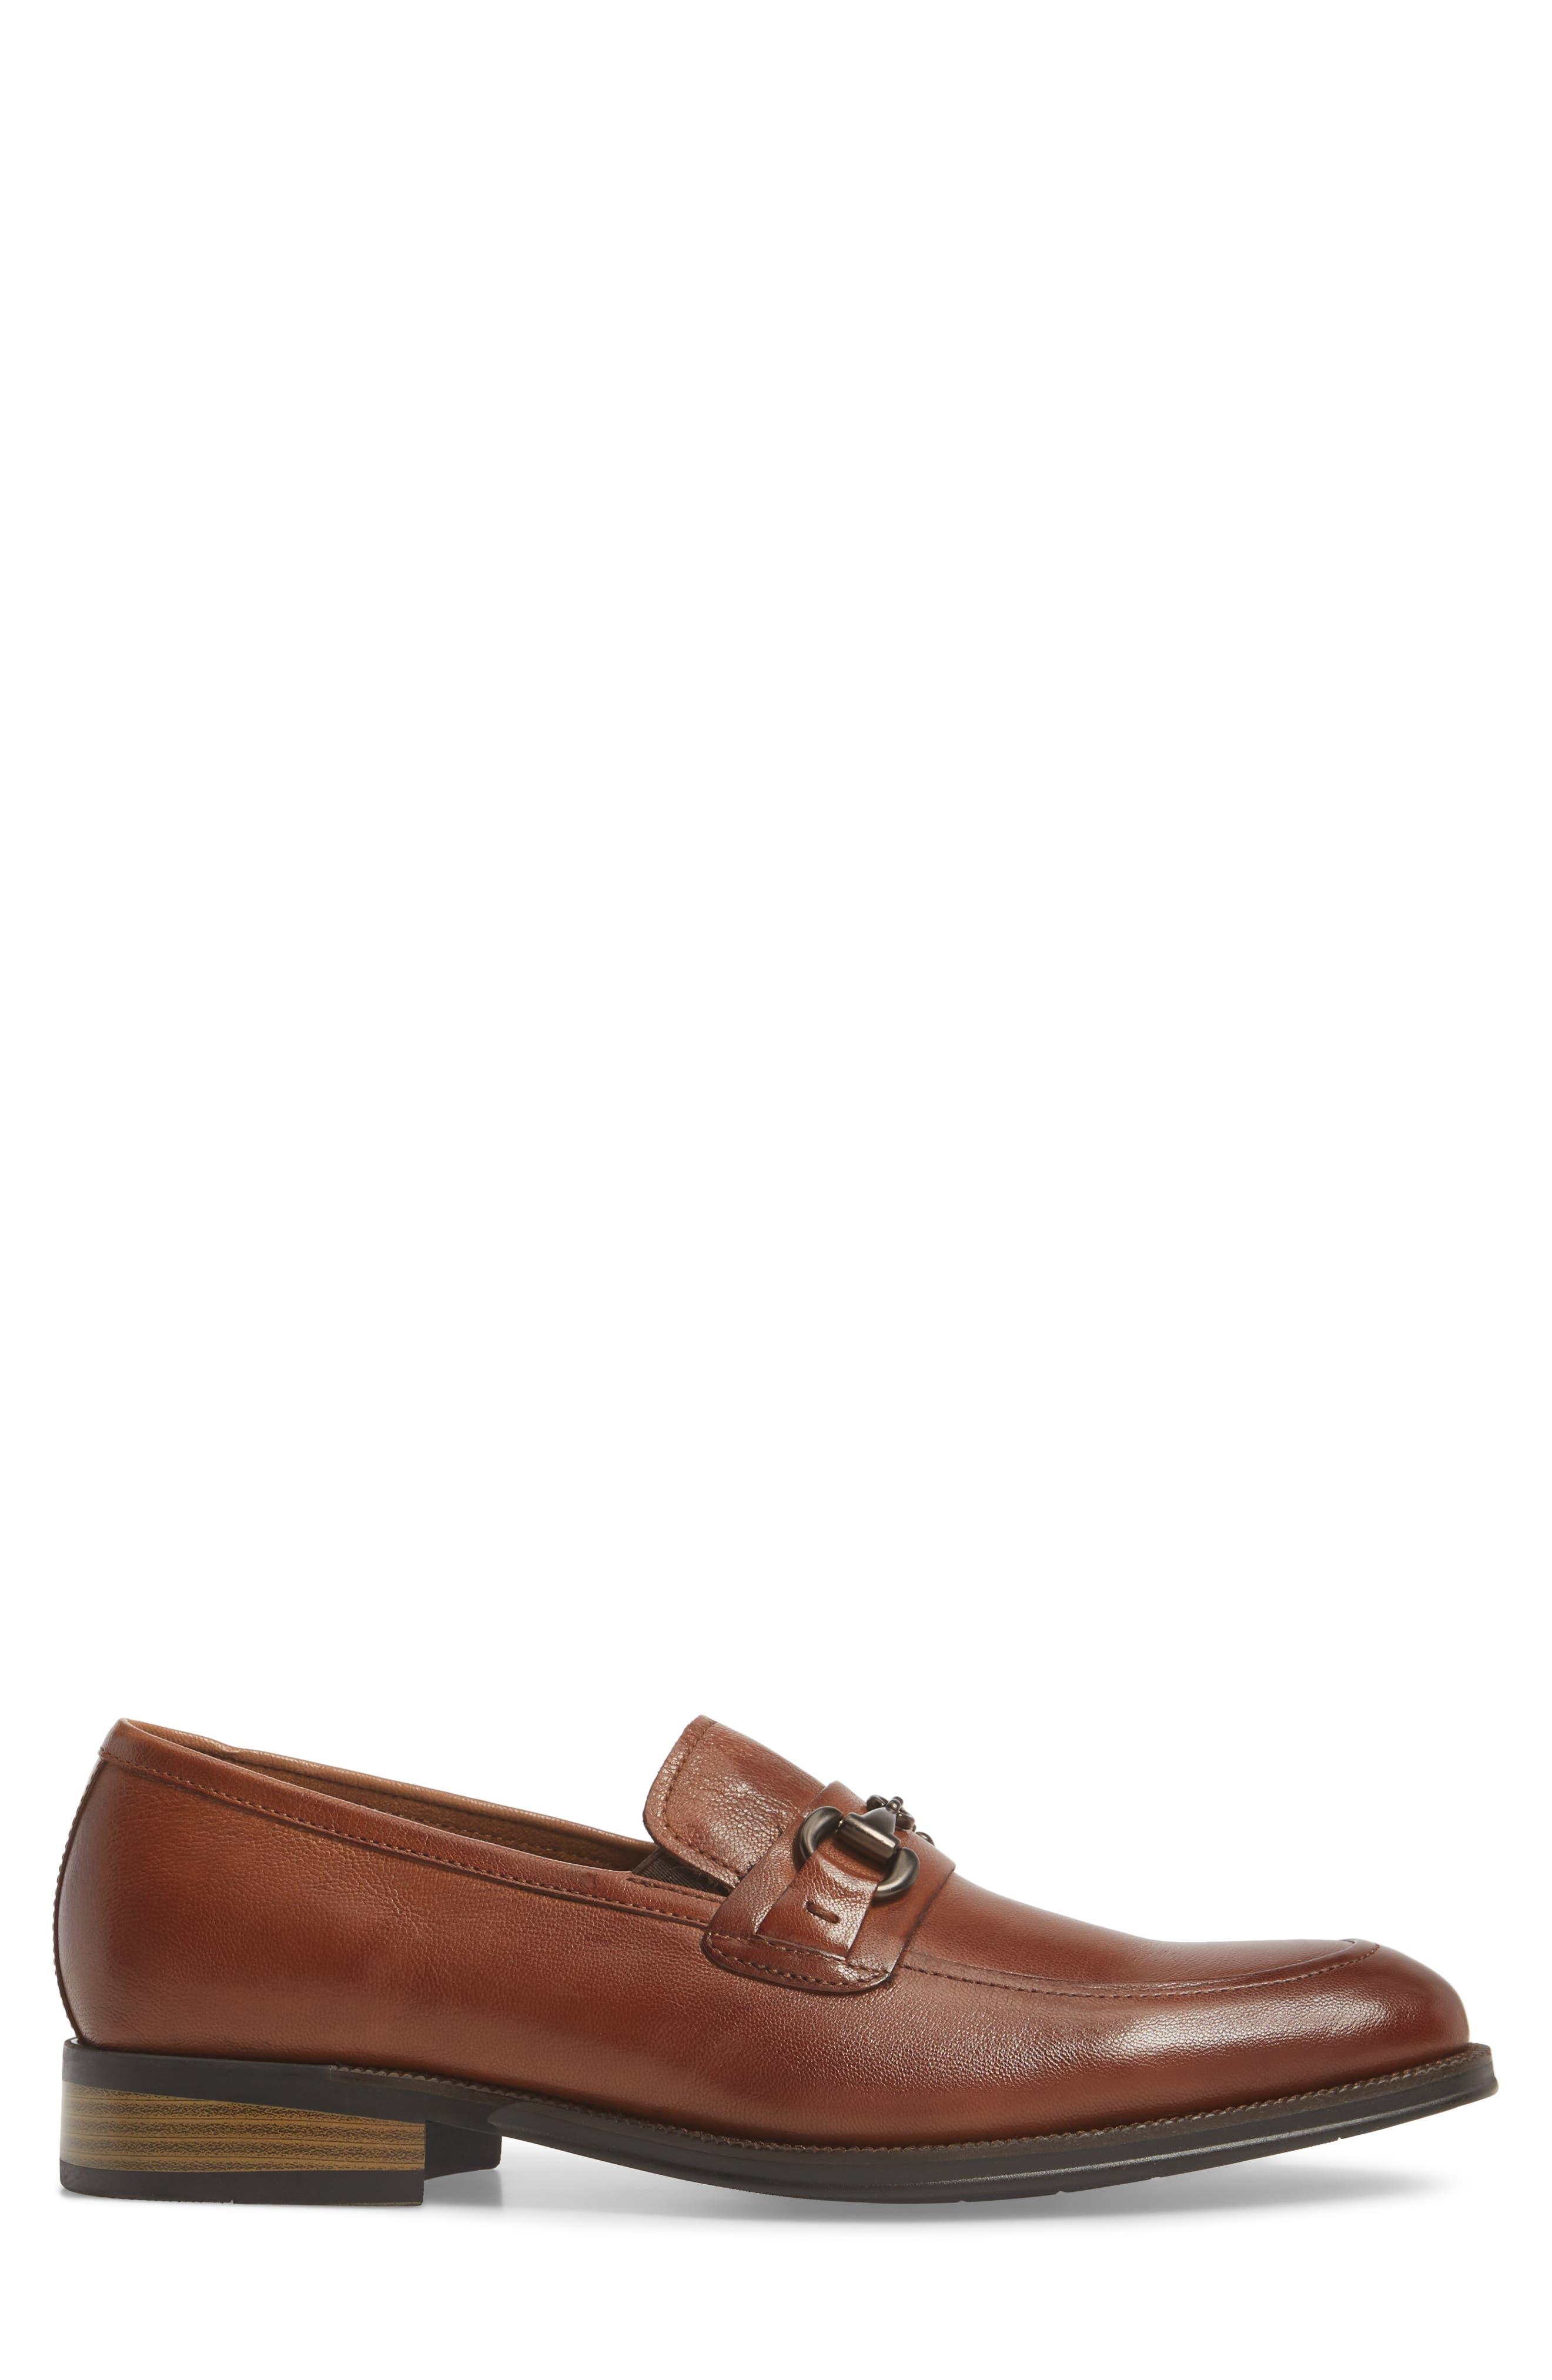 Brock Bit Loafer,                             Alternate thumbnail 3, color,                             Cognac Leather